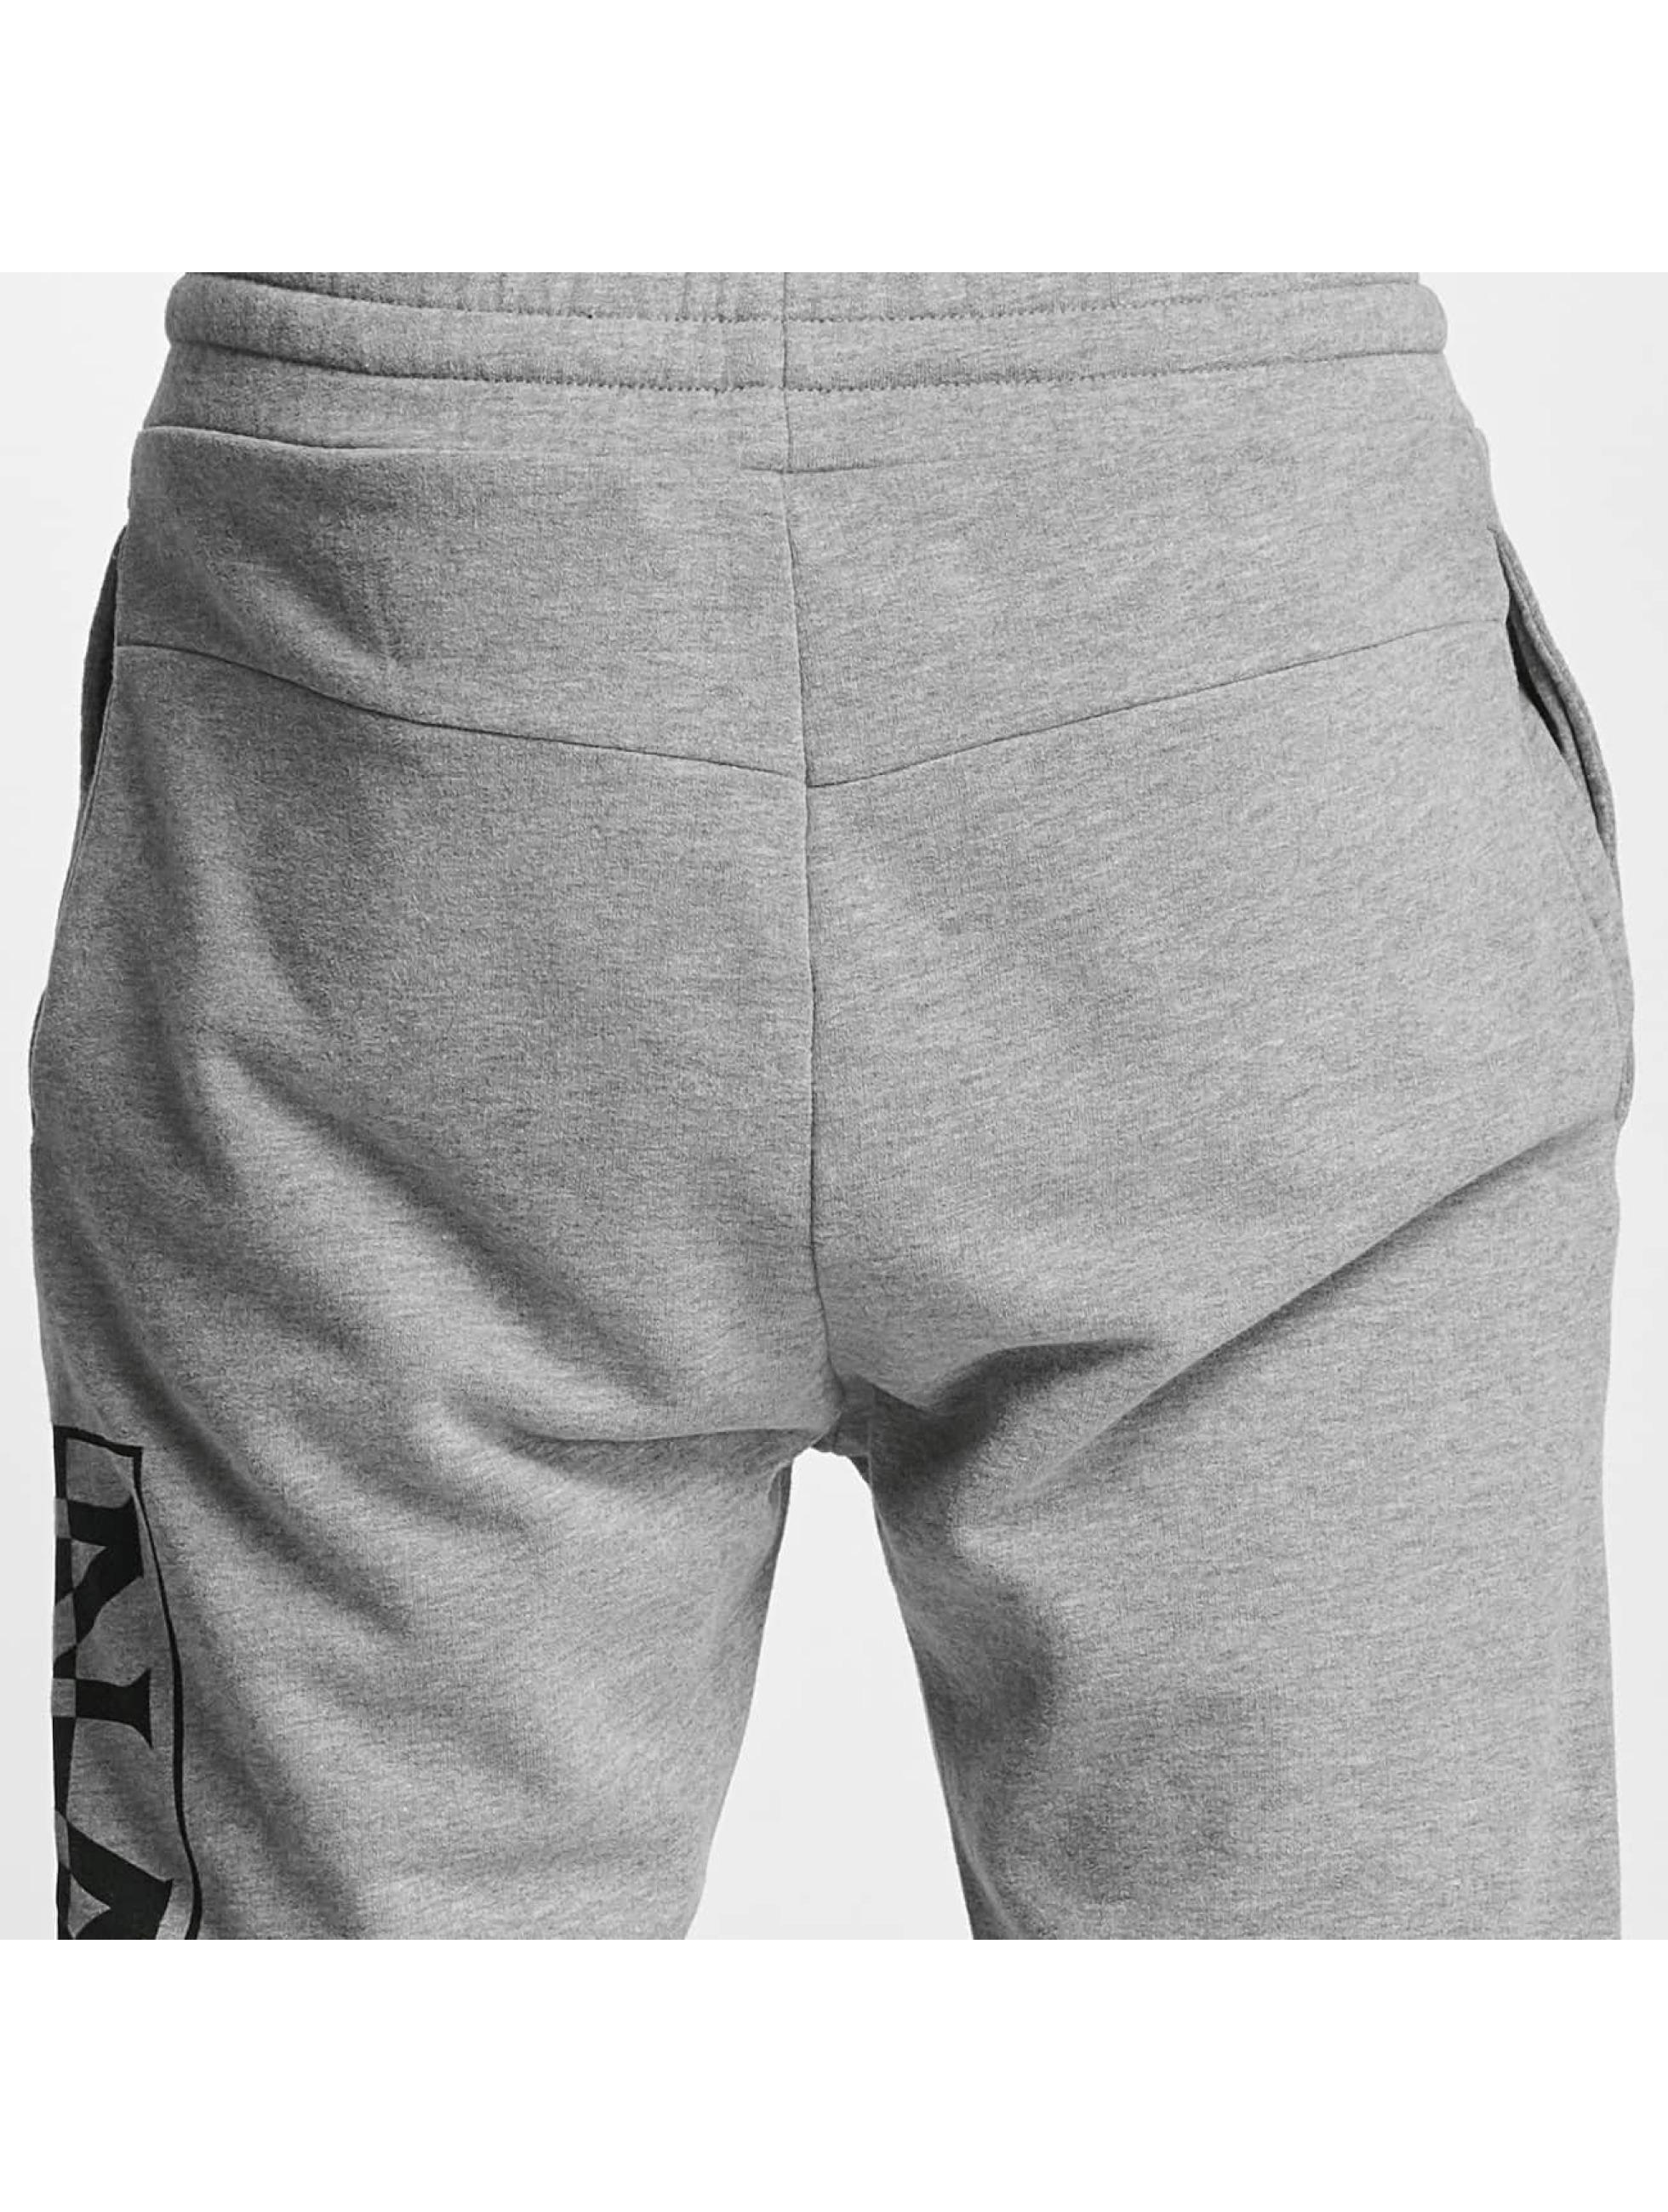 Napapijri Spodnie do joggingu Maget szary